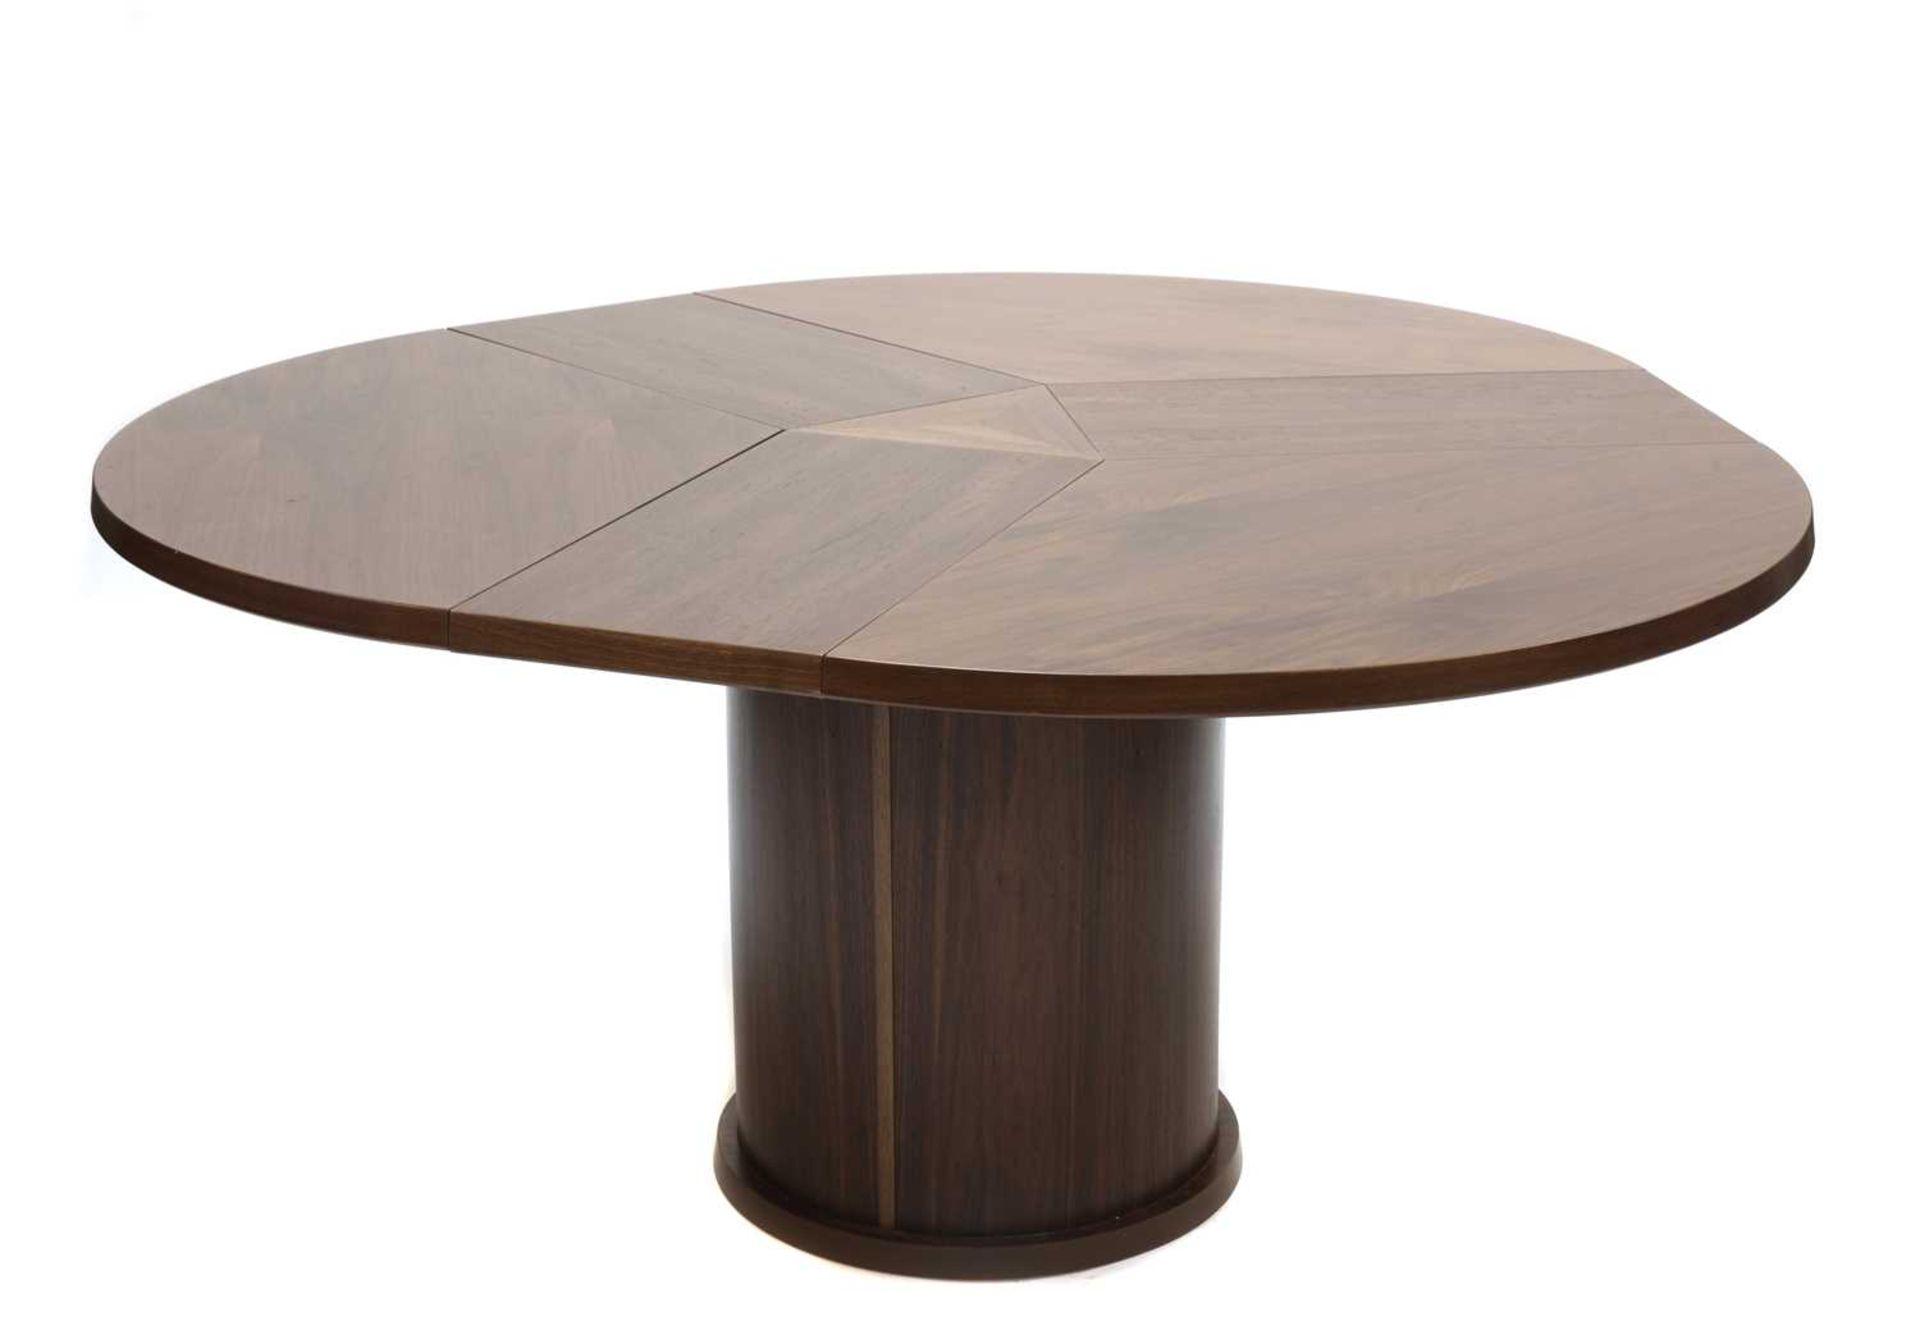 A Skovby 'Confide' walnut veneered extending circular dining table - Image 3 of 7